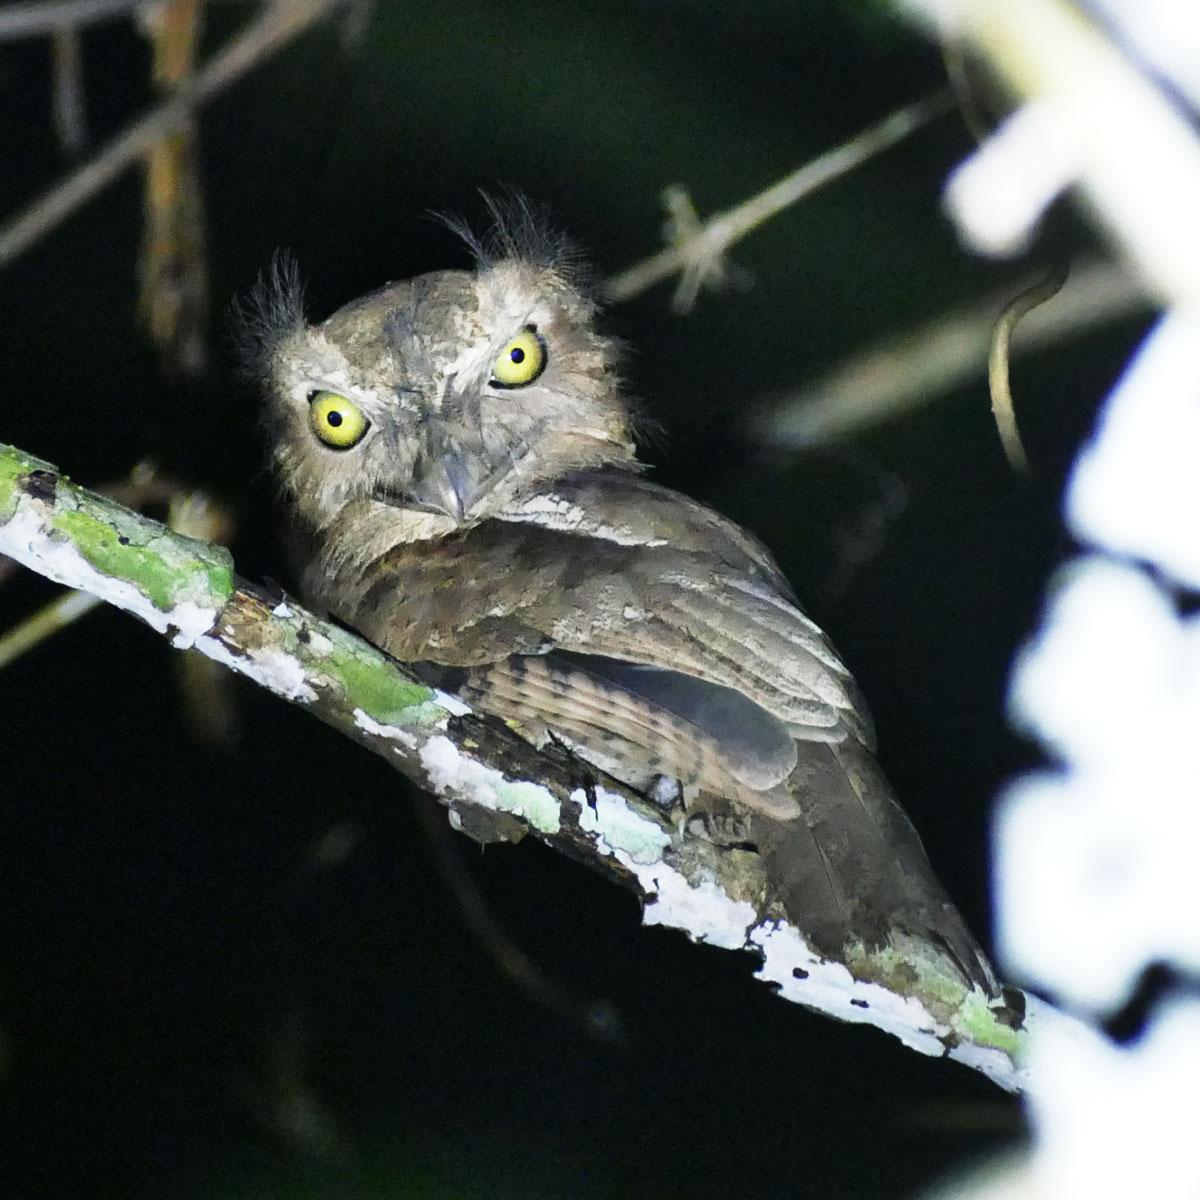 A Palawan Frogmouth awakes after dark. Noah Strycker